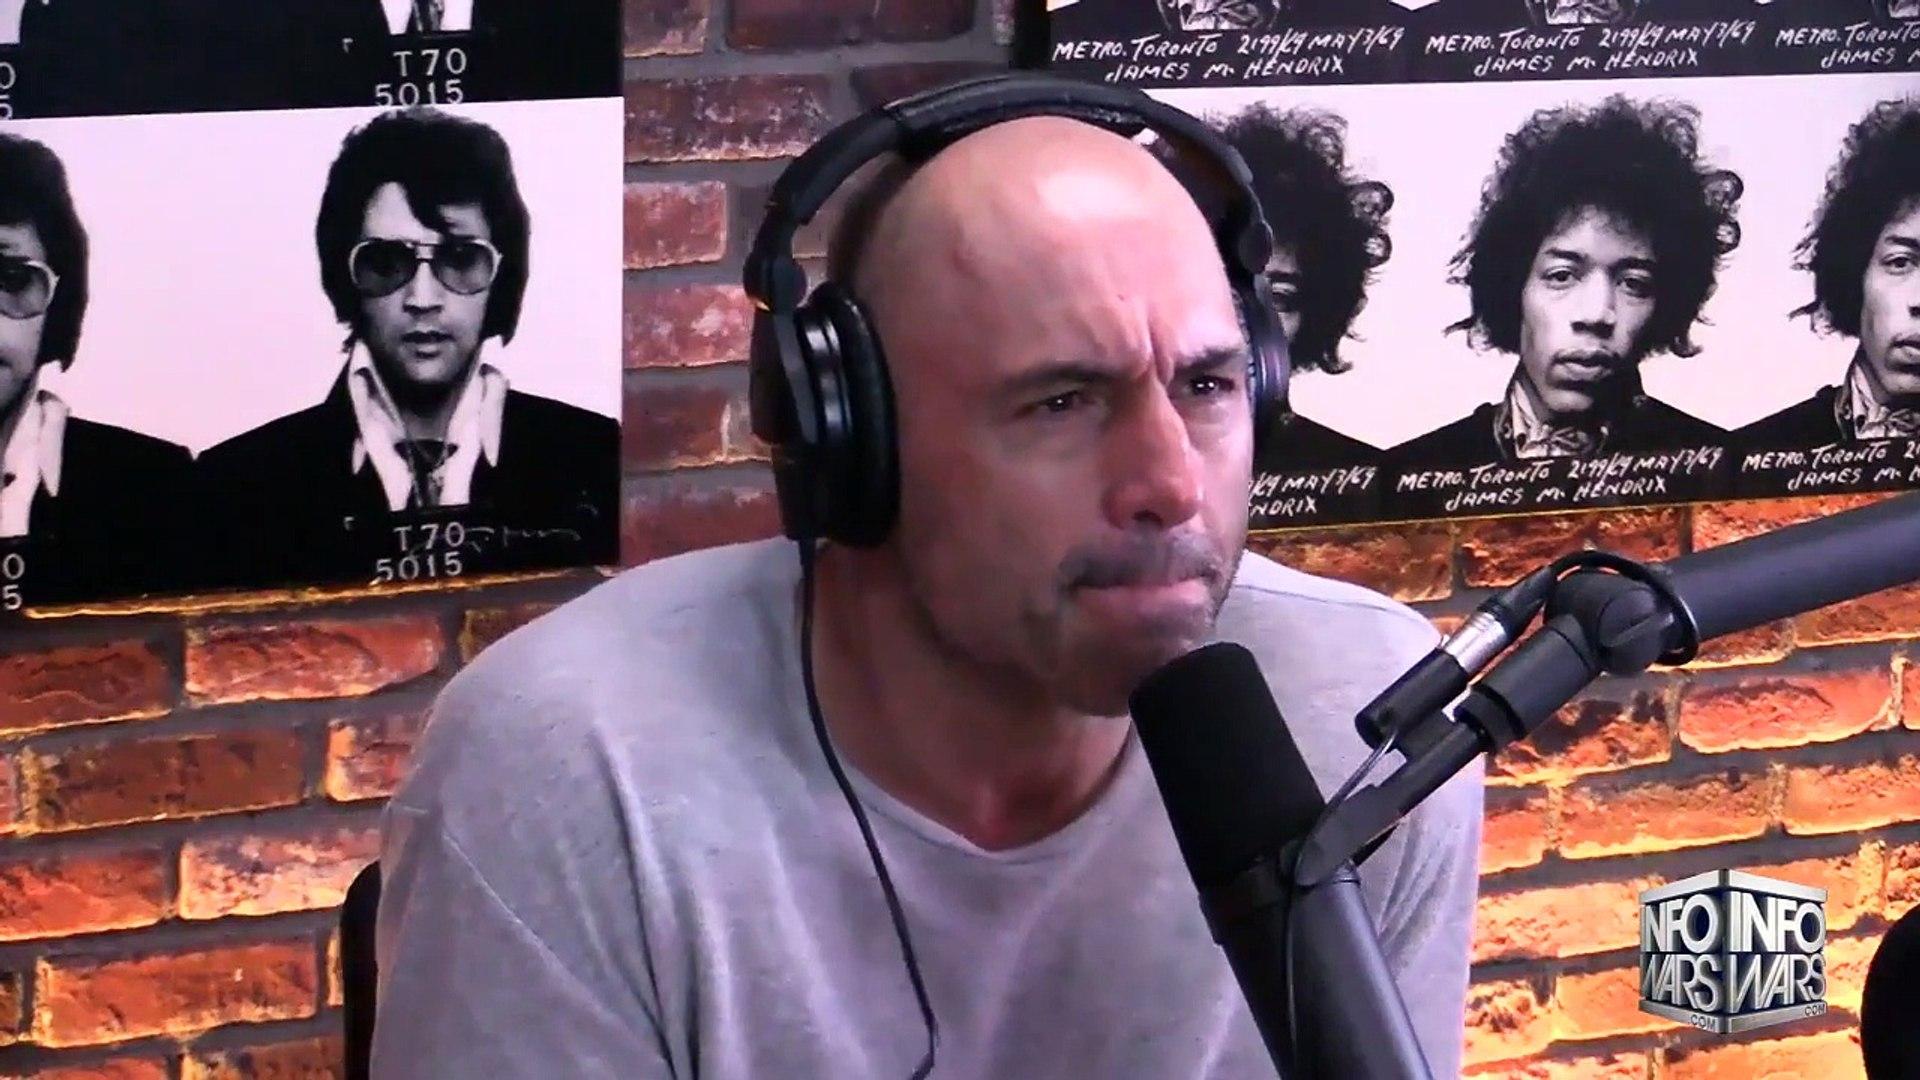 Alex Jones & Joe Rogan Breakdown  PizzaGate Pedophile Cult